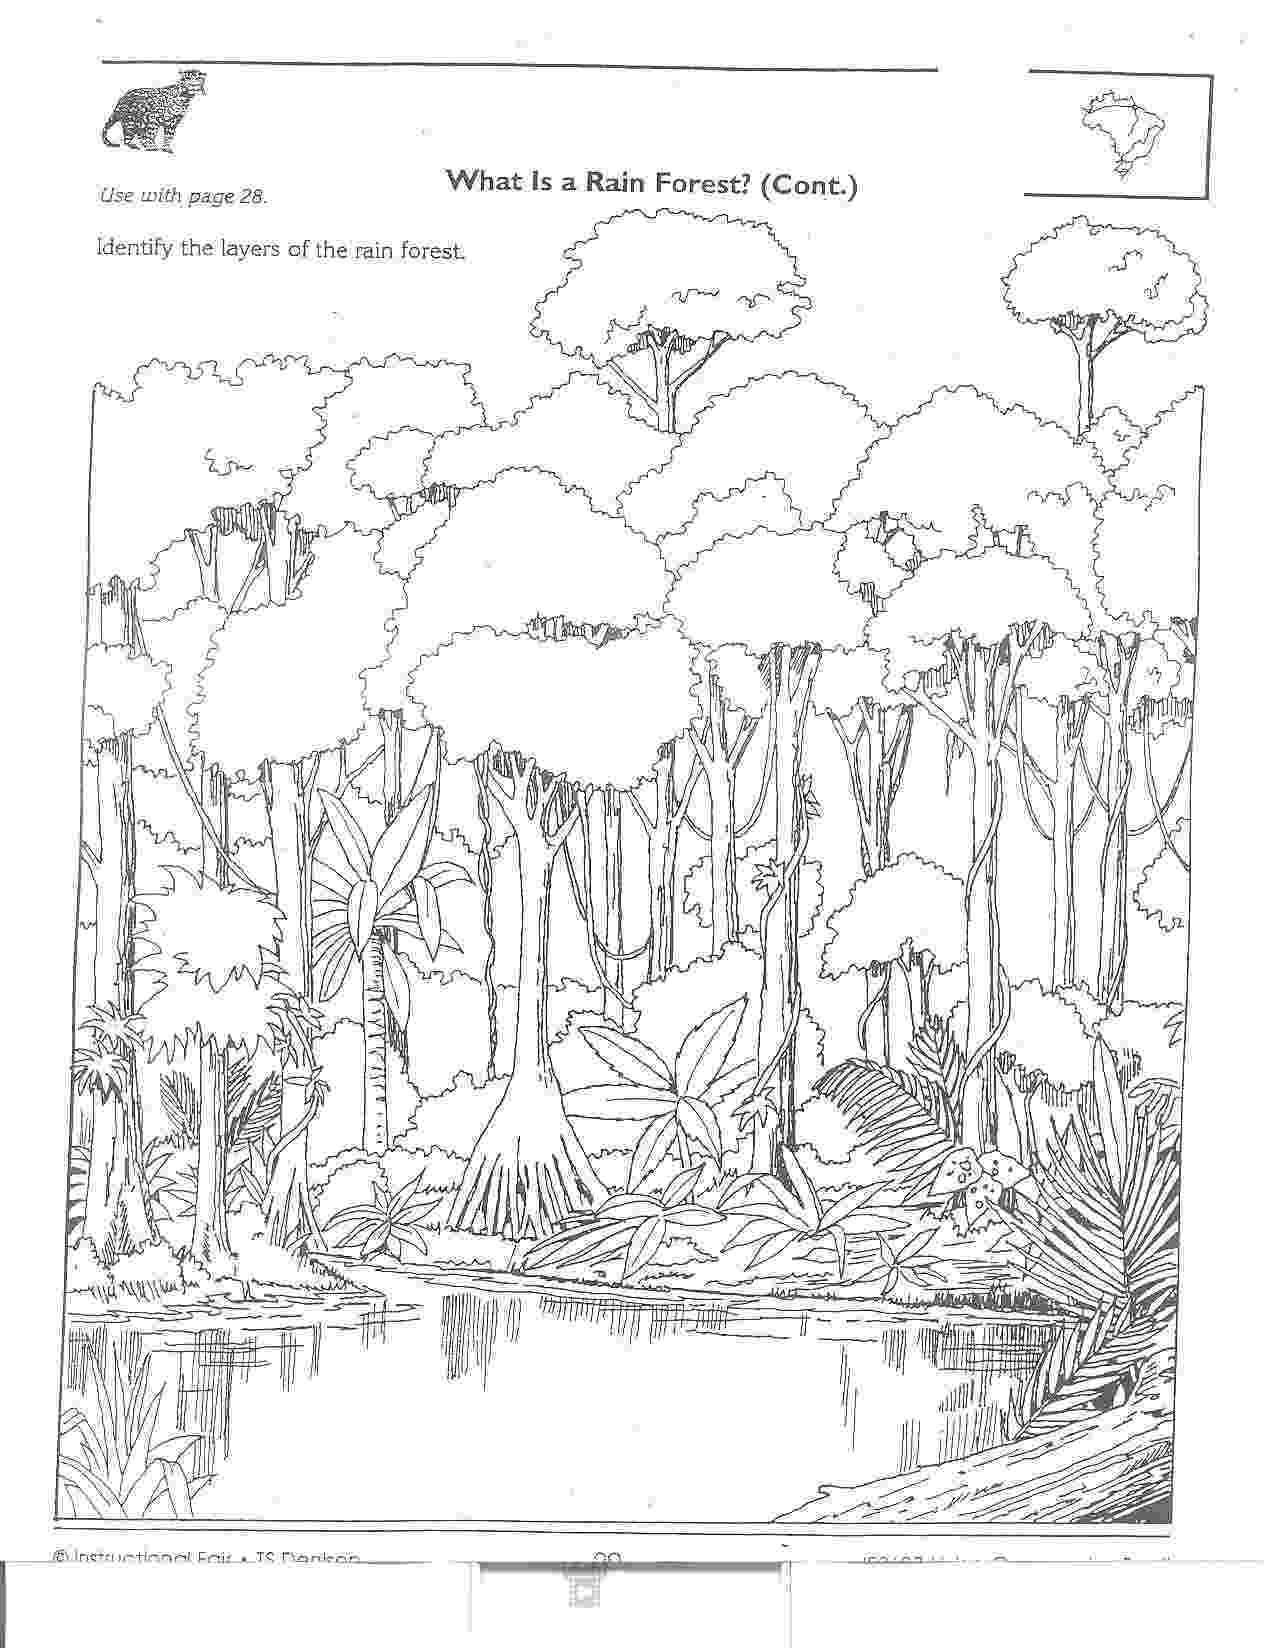 rainforest coloring pages jungle scene coloring pages coloring home rainforest coloring pages